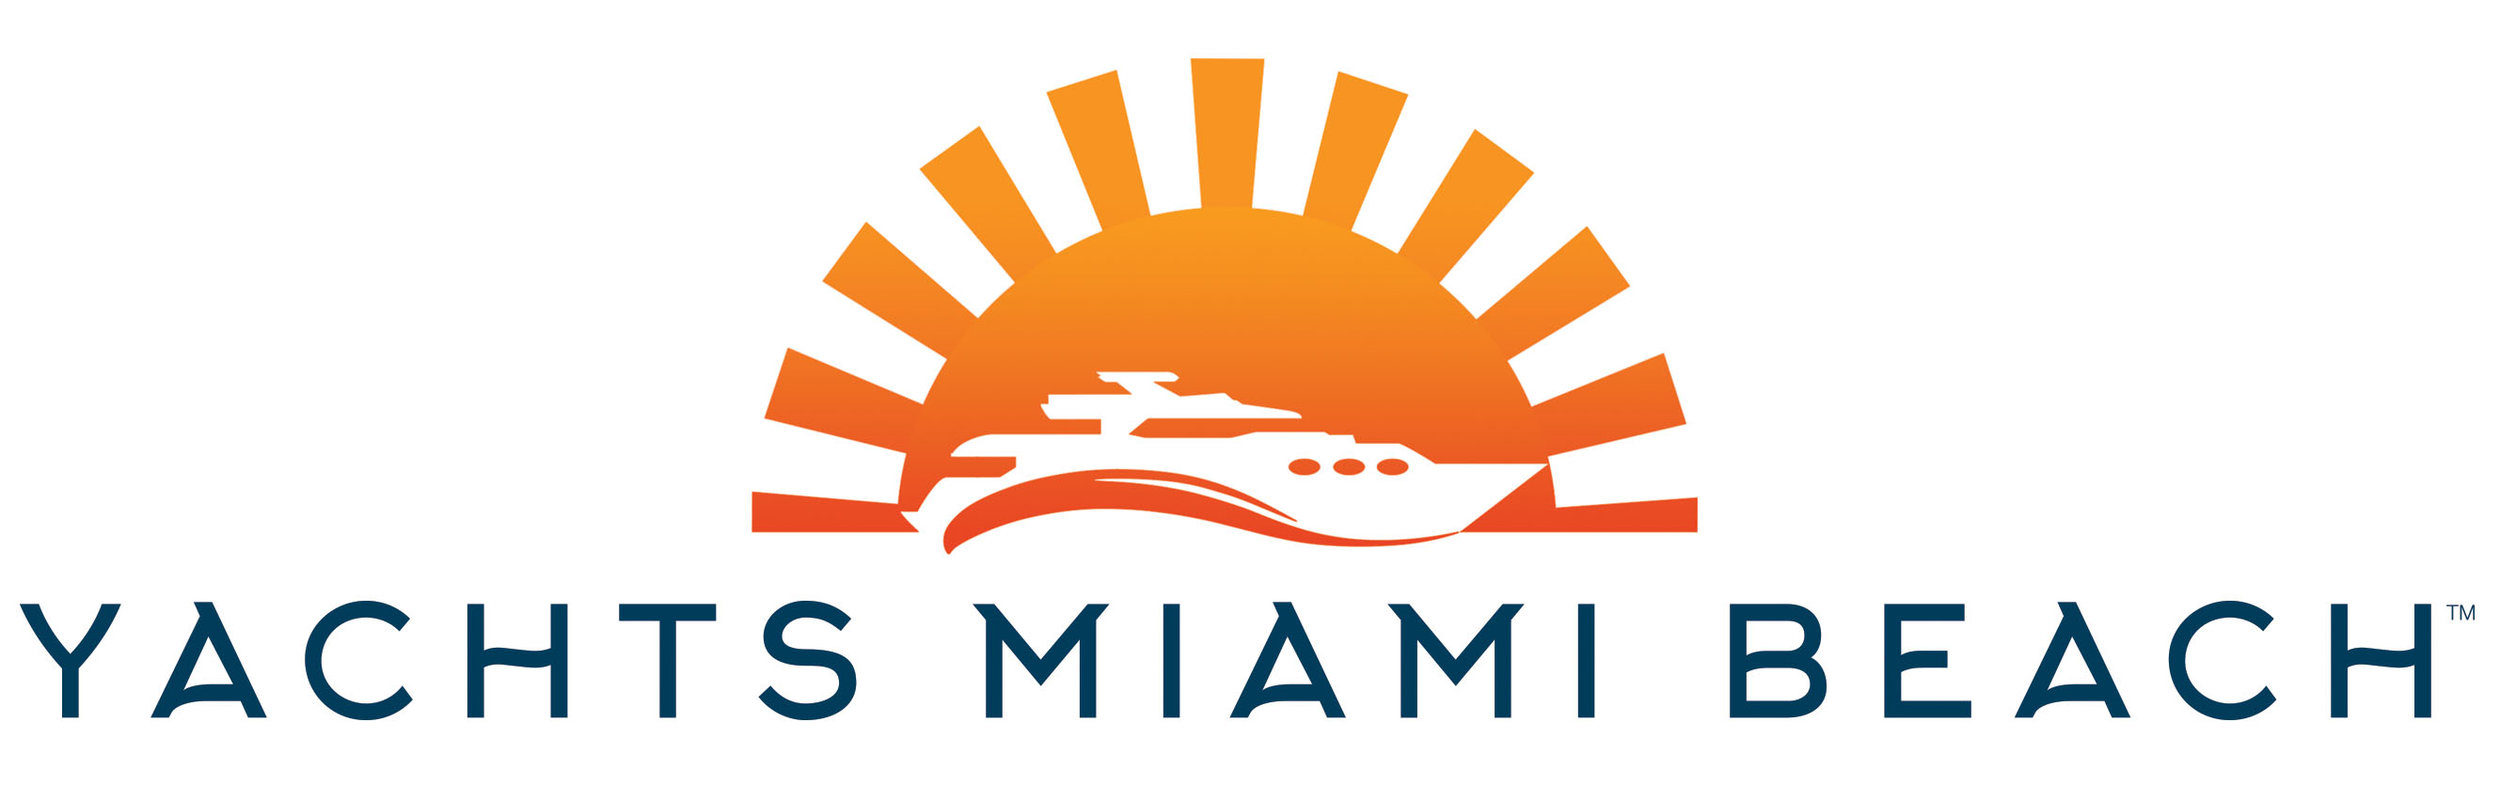 Yachts Miami Beach, Boat Show Miami